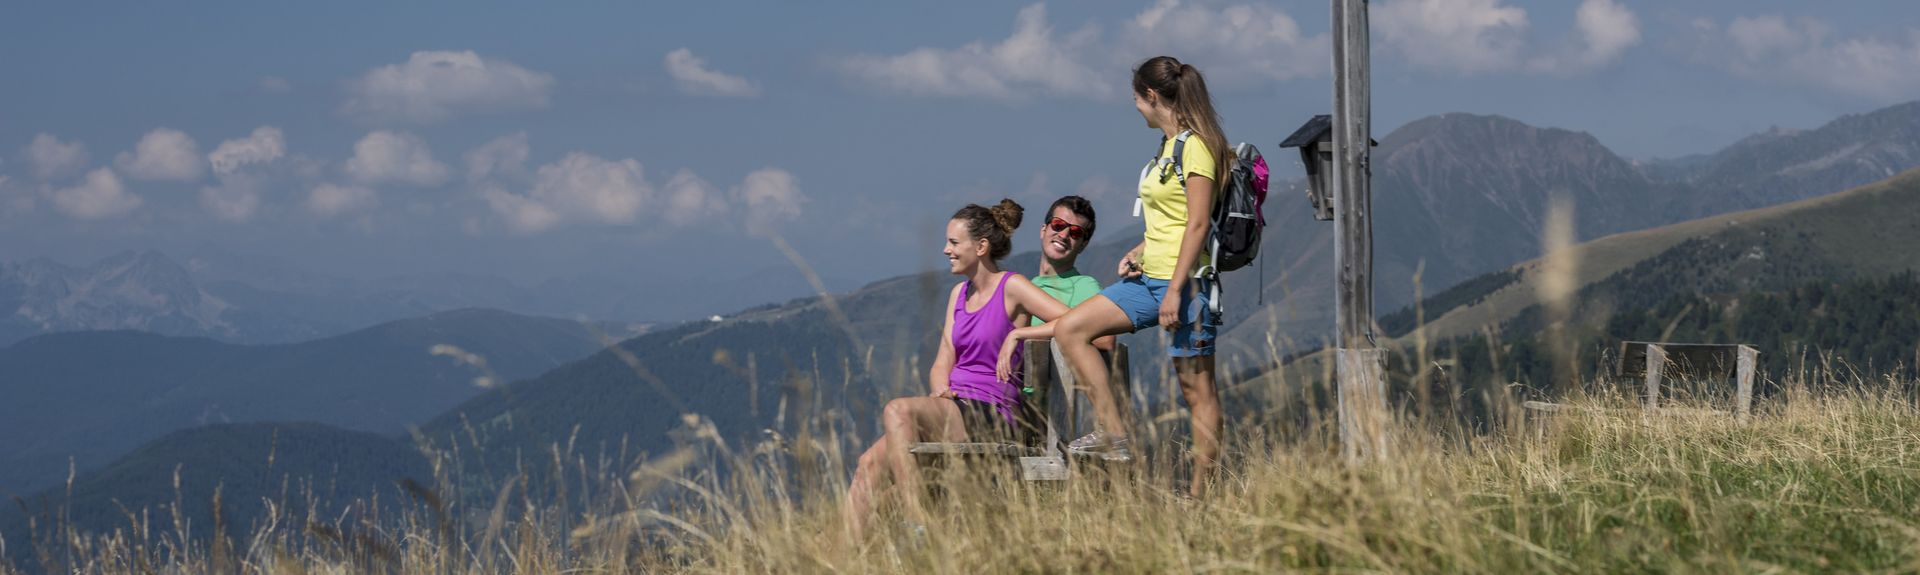 Terento, Trentino-Alto Adige, Italia